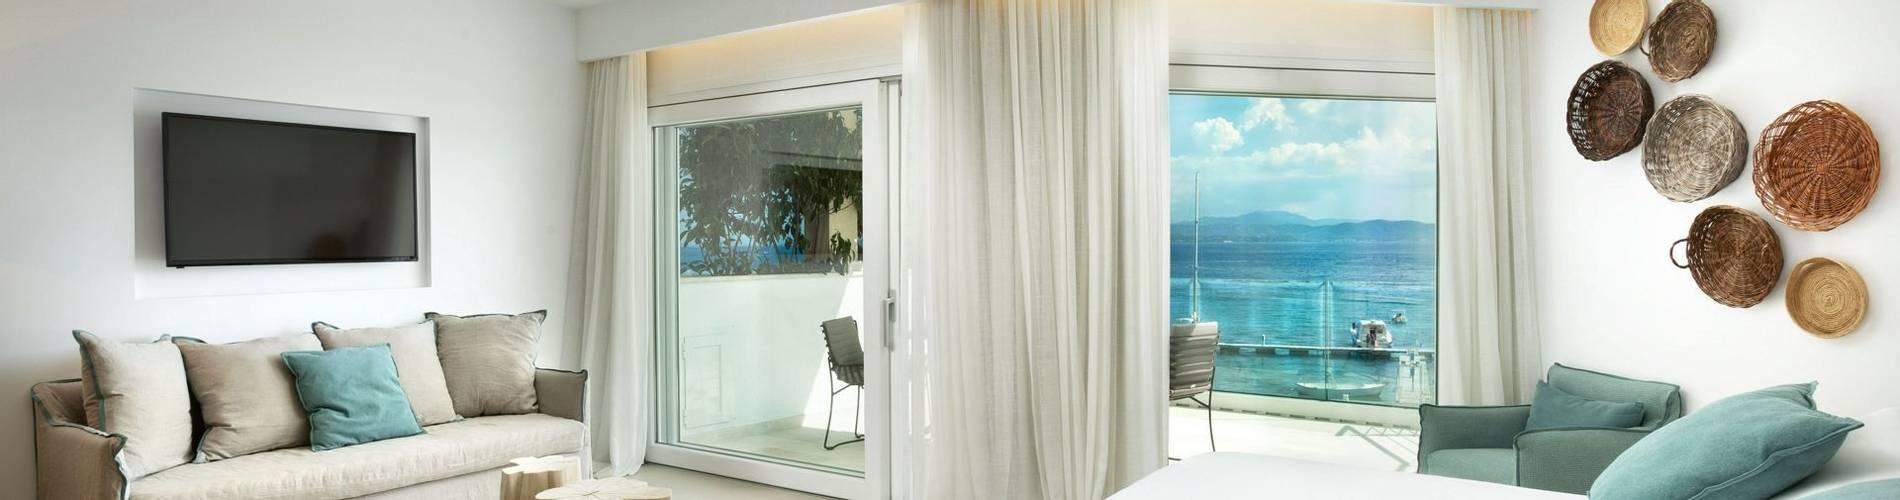 Pool Suite - Gabbiano Azzurro Hotel Sardinia10.jpg